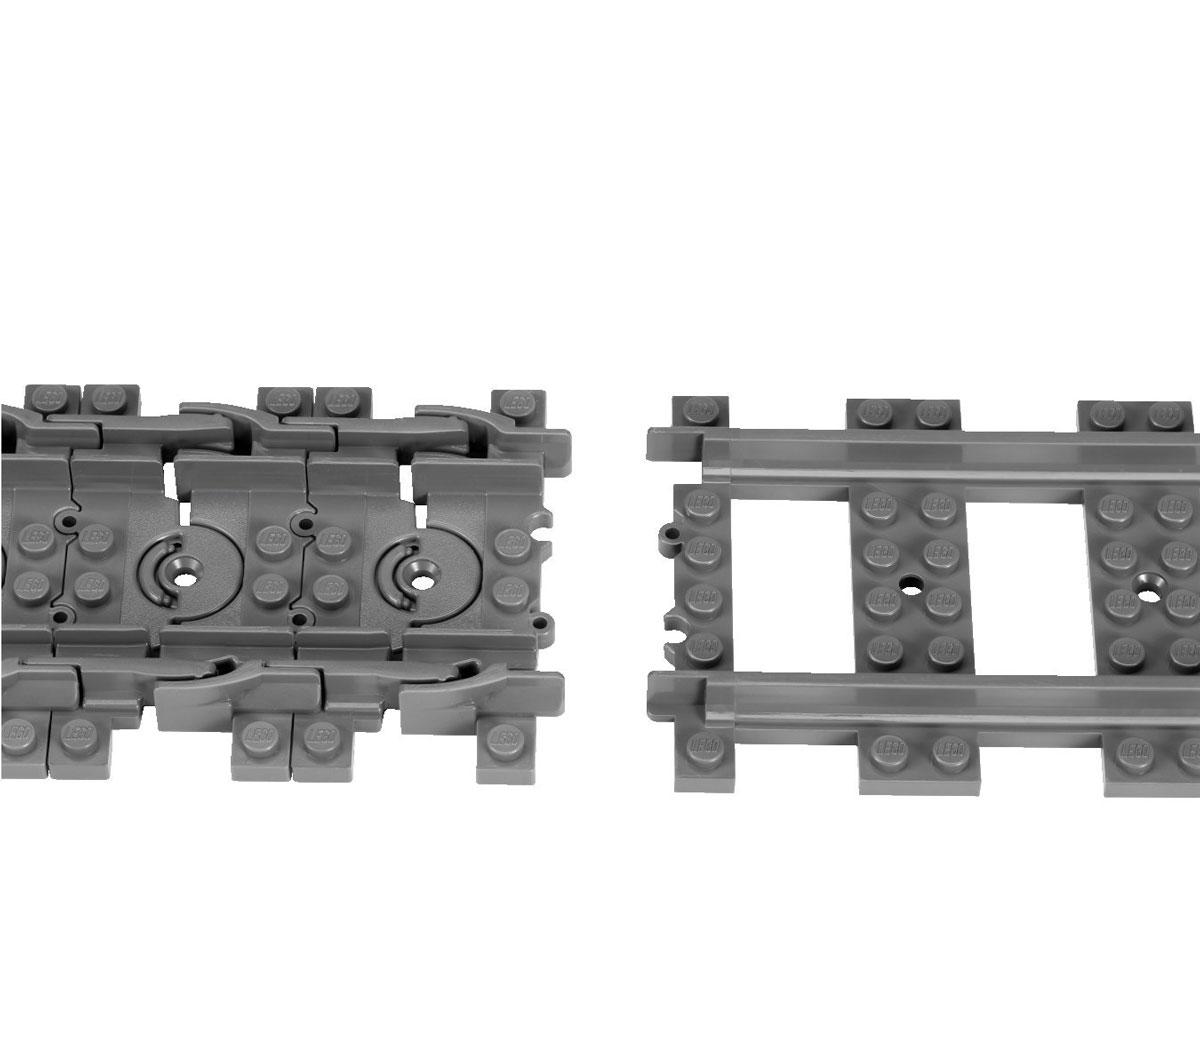 LEGO City Конструктор Гибкие пути